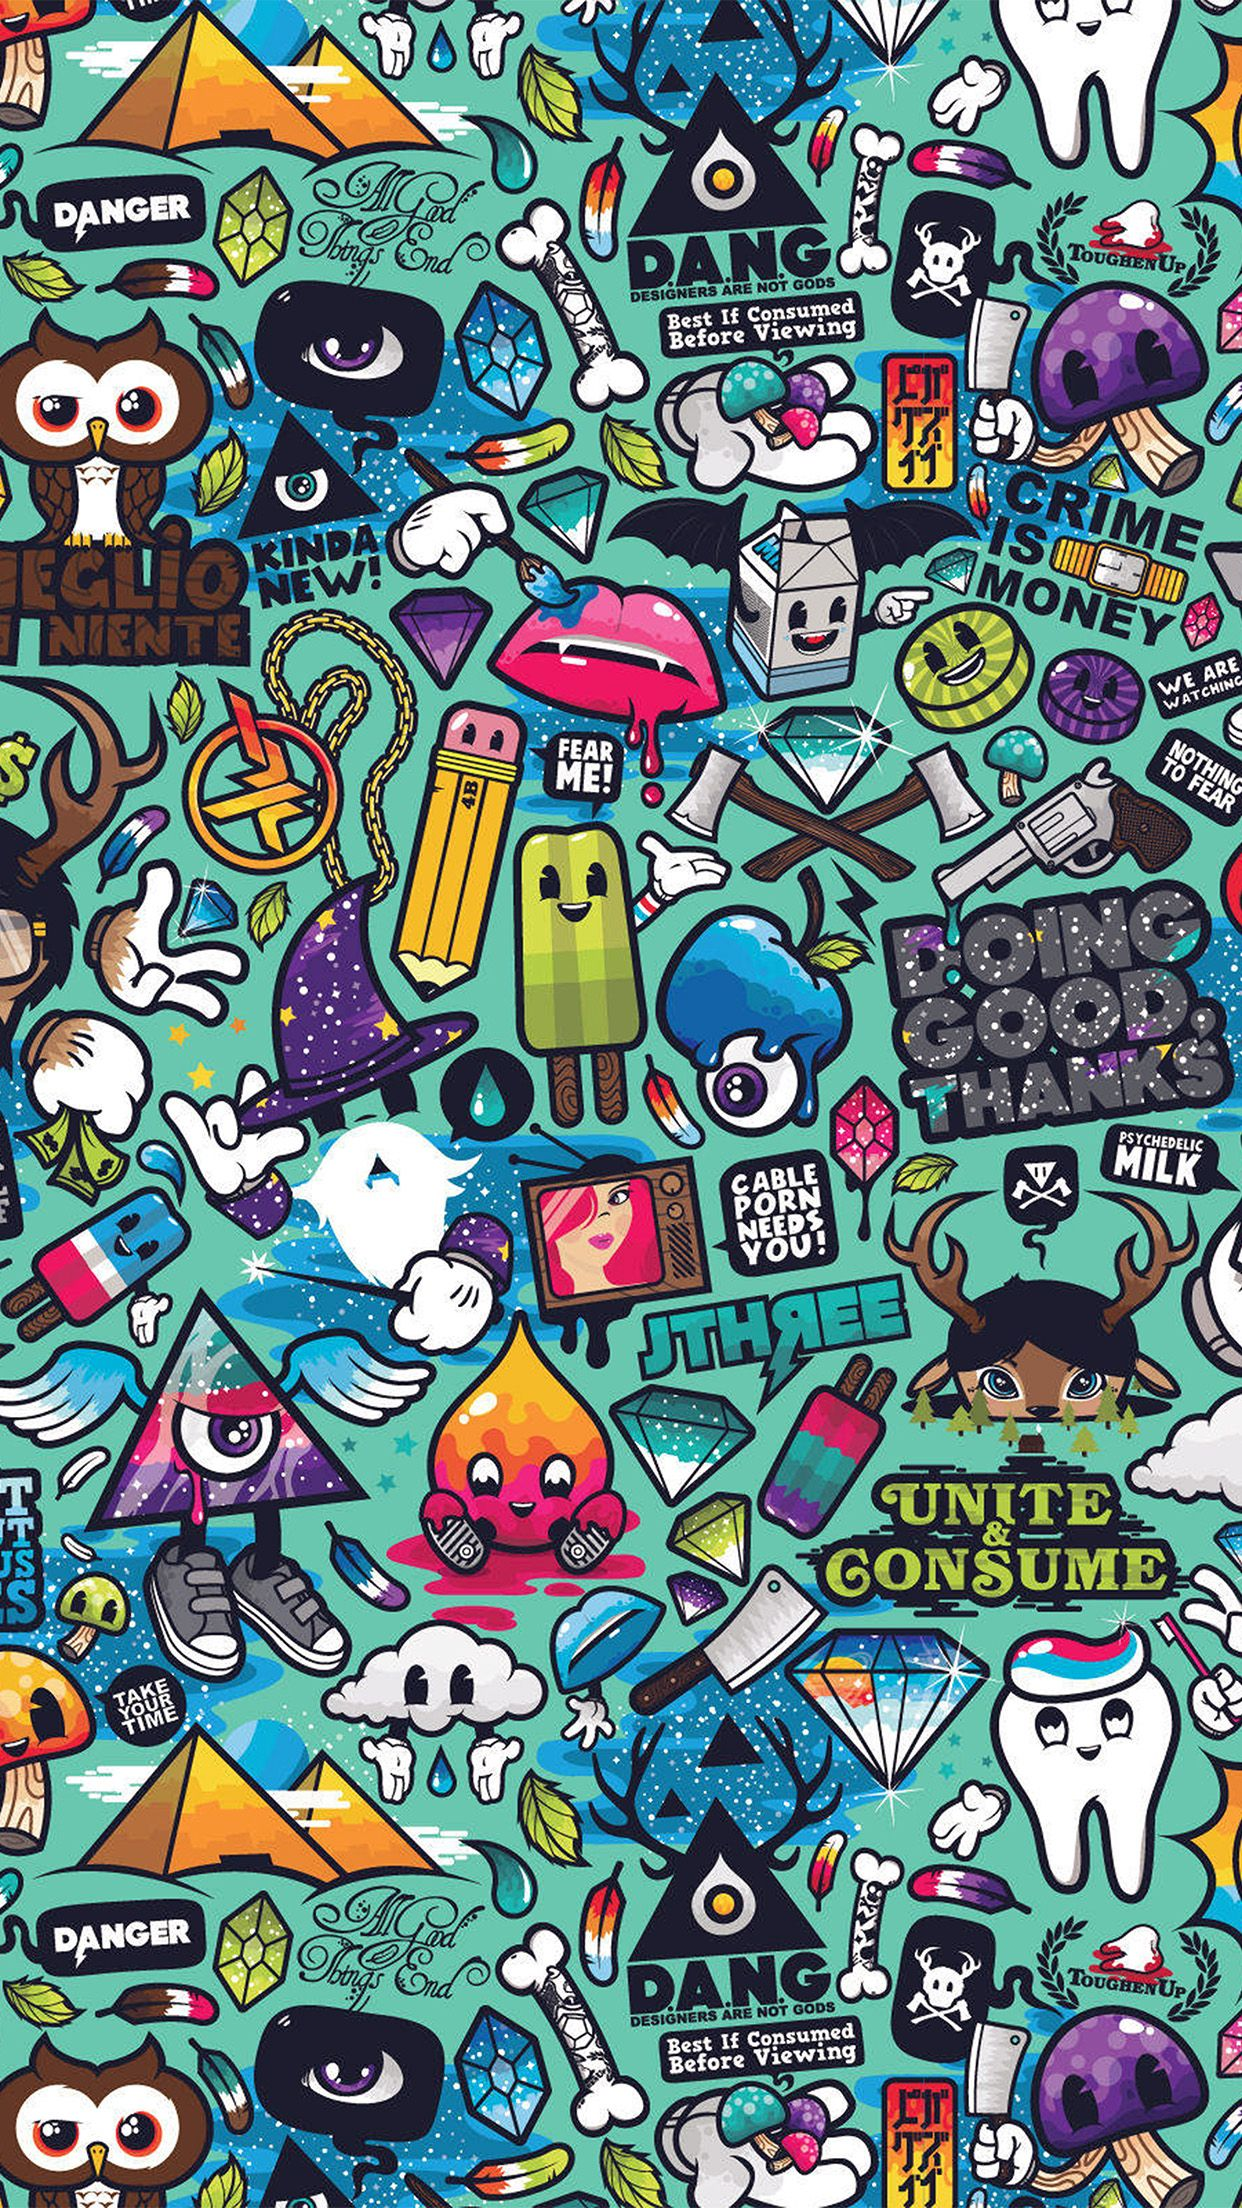 awesome artworkpatternillustrationgraffitiiphone6